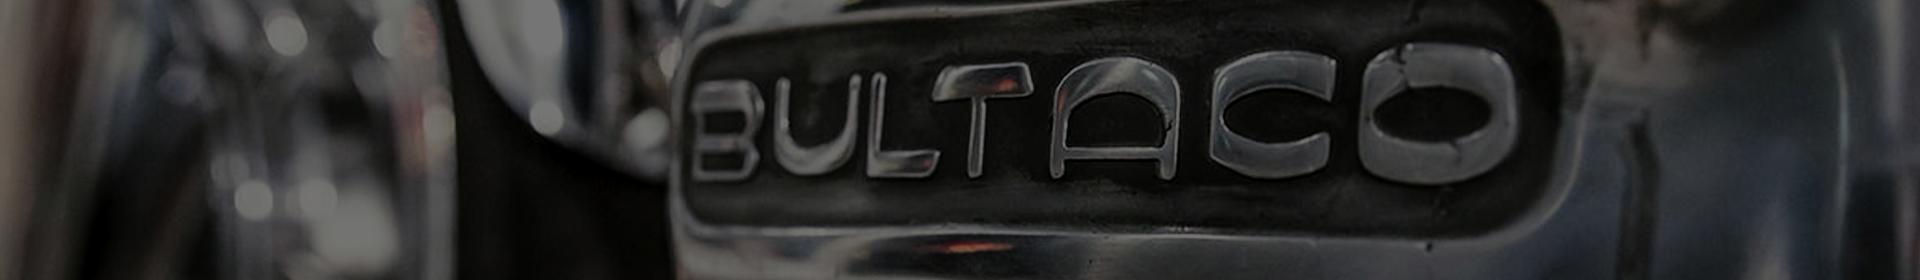 bultaco-banner.png